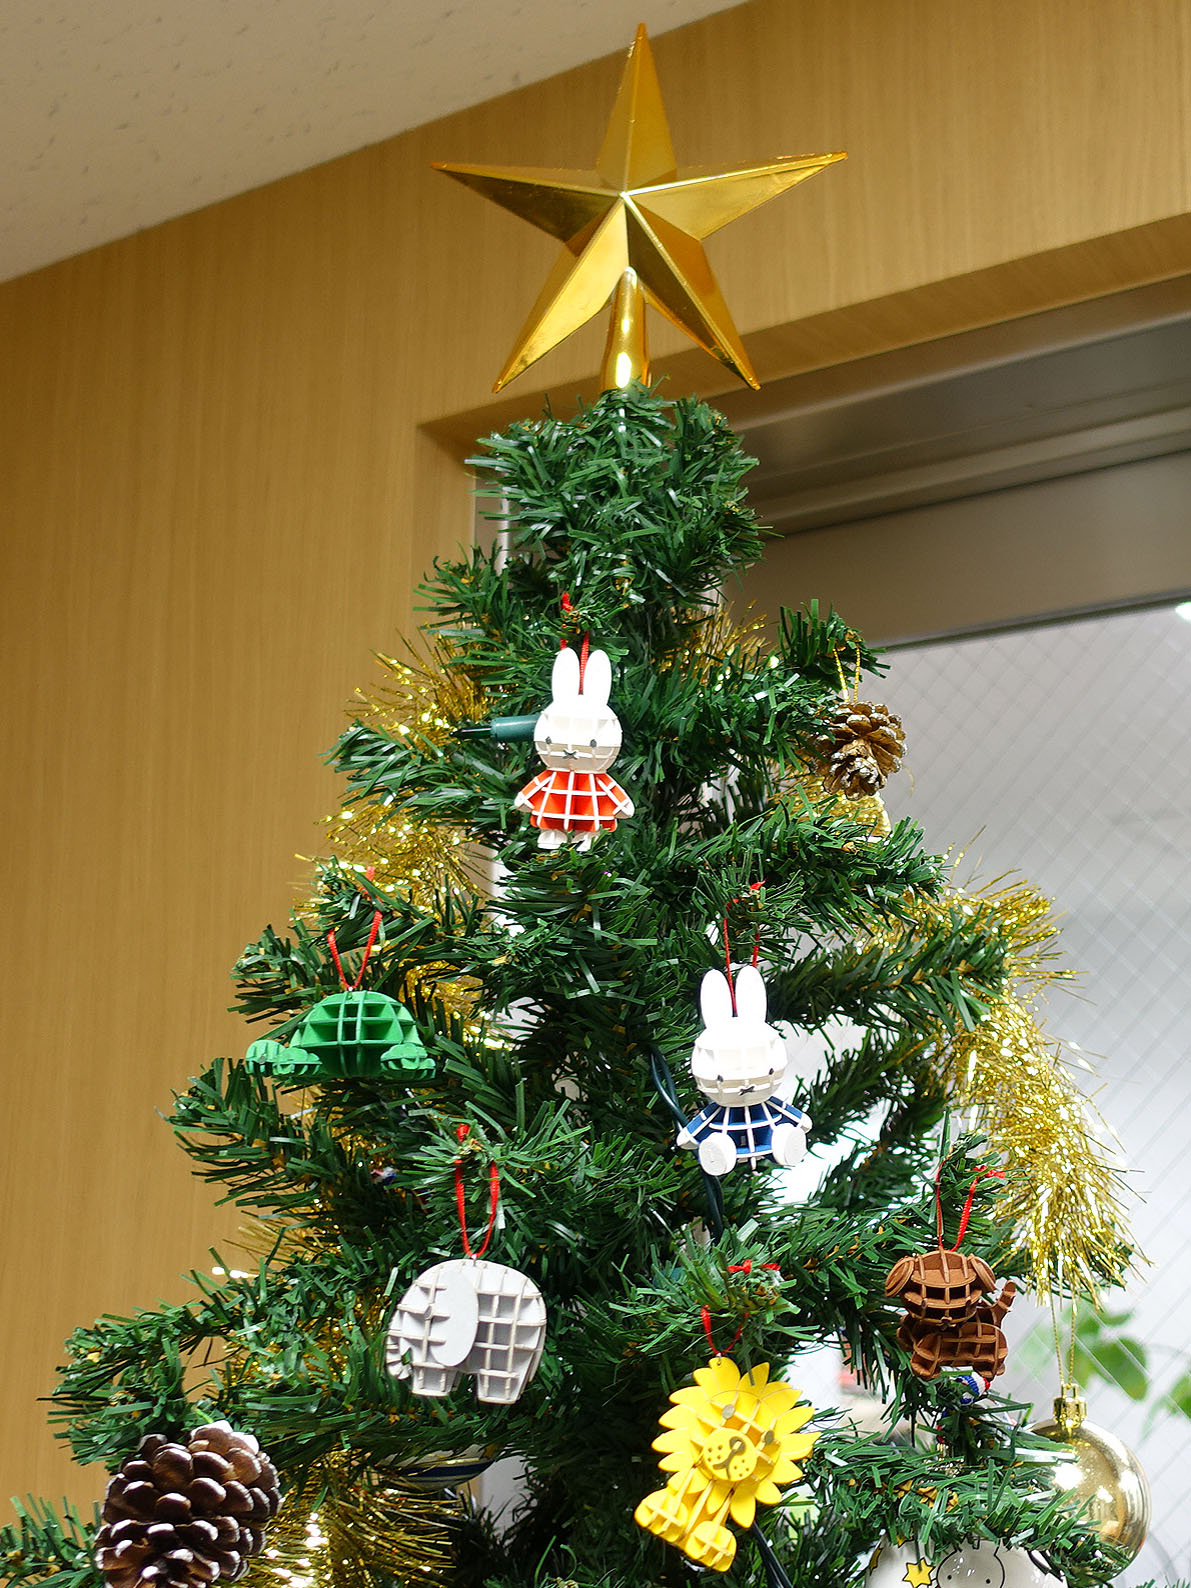 si-gu-mi_クリスマスツリー